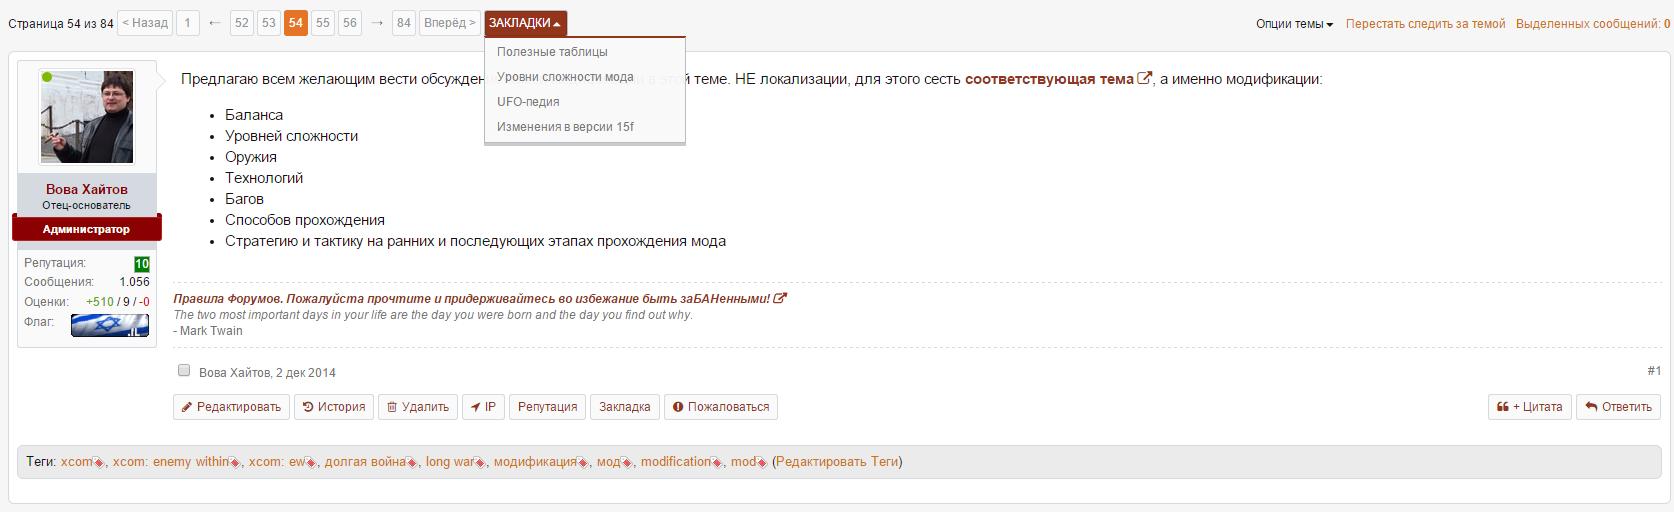 Threadmarks.png